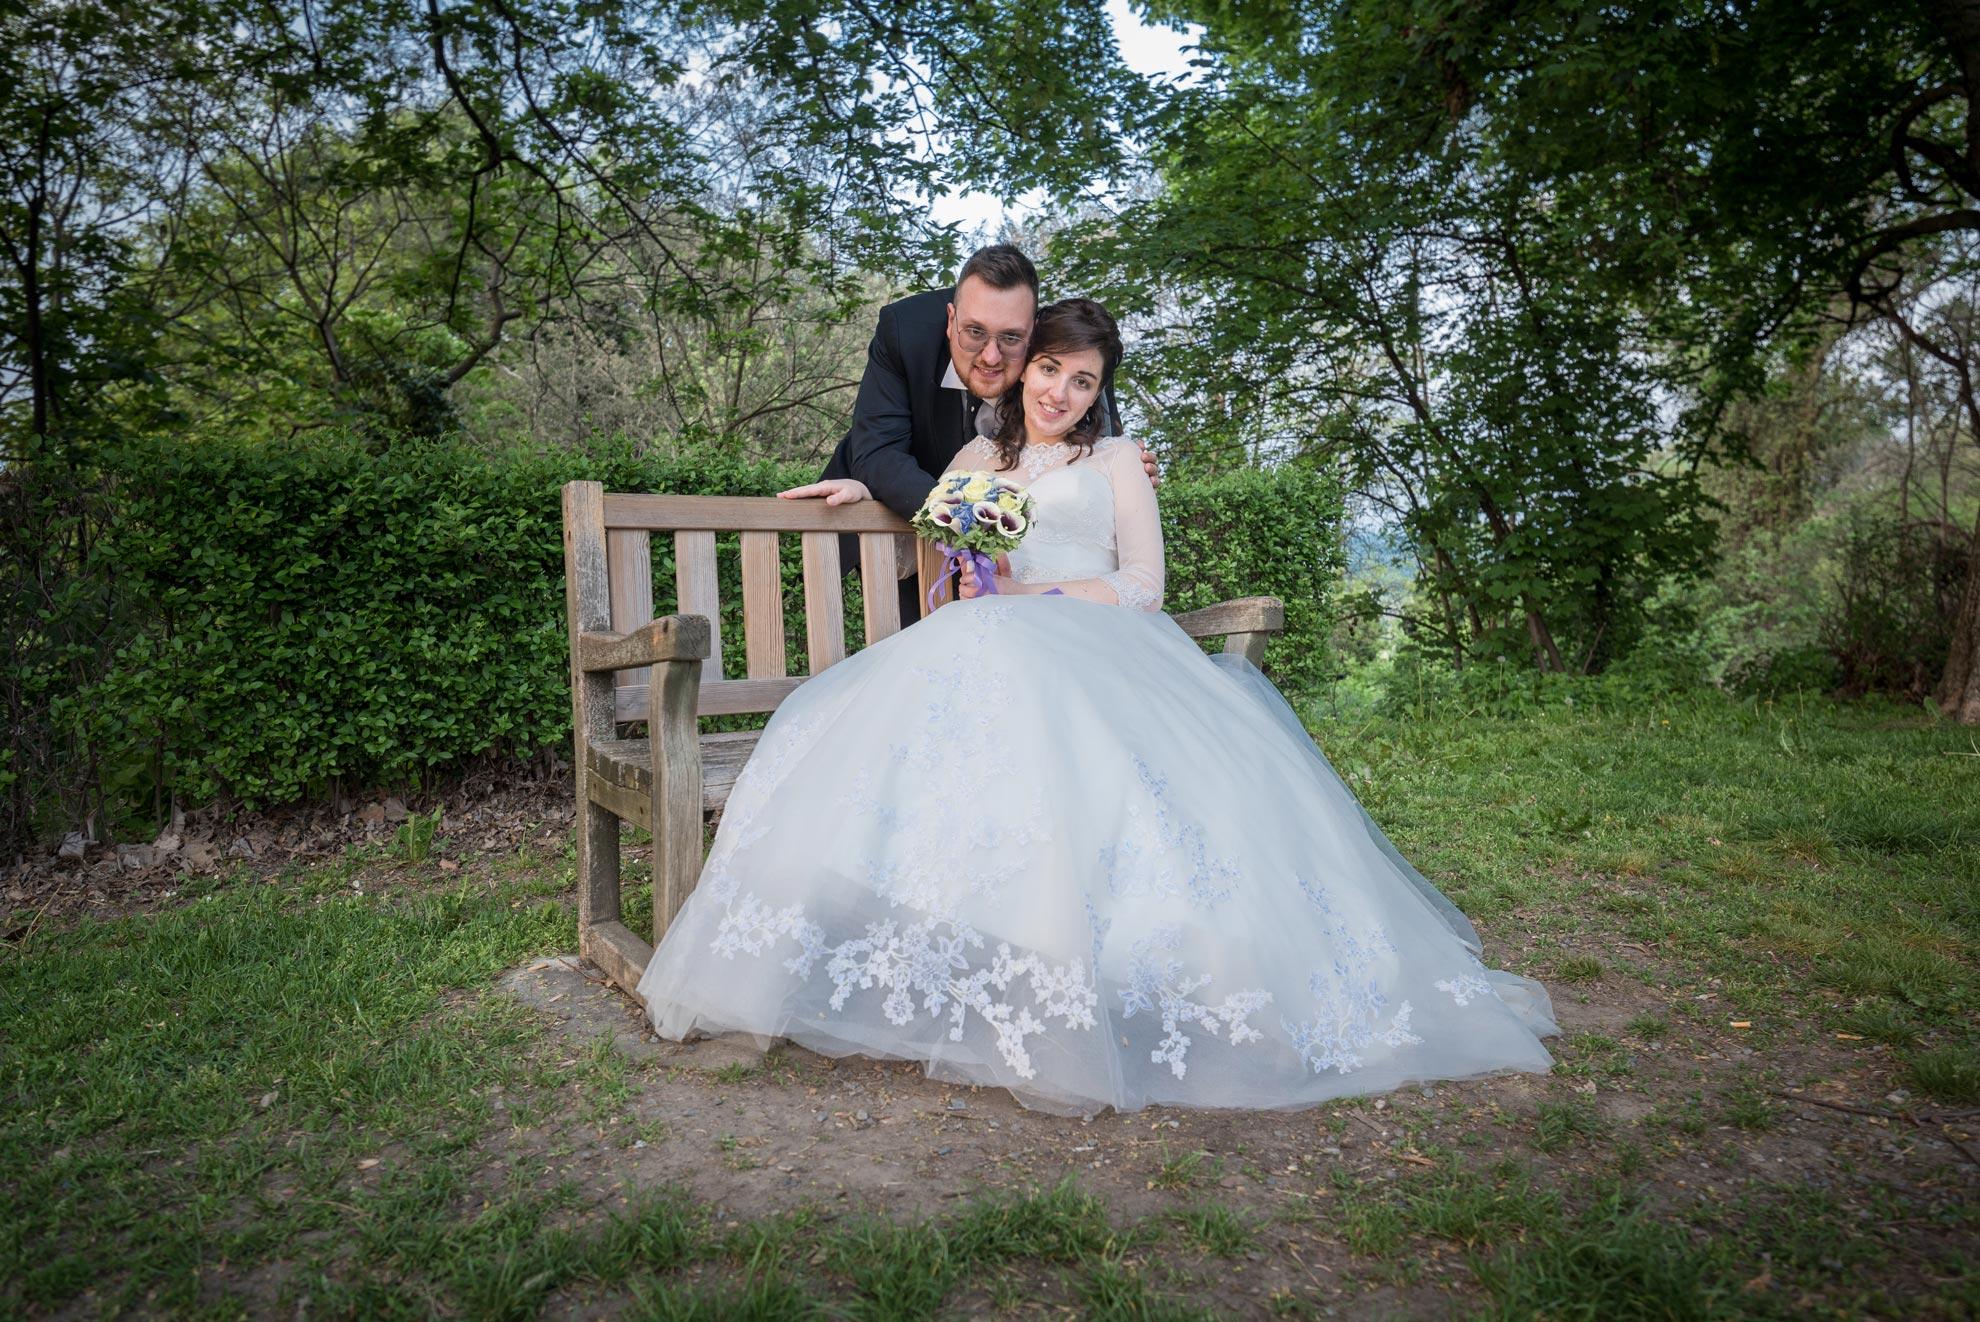 Matrimonio a Narzole Lorenza Diego - DSC 0733 - Fotografo Matrimonio a Cherasco - Fotografo Matrimonio a Cherasco